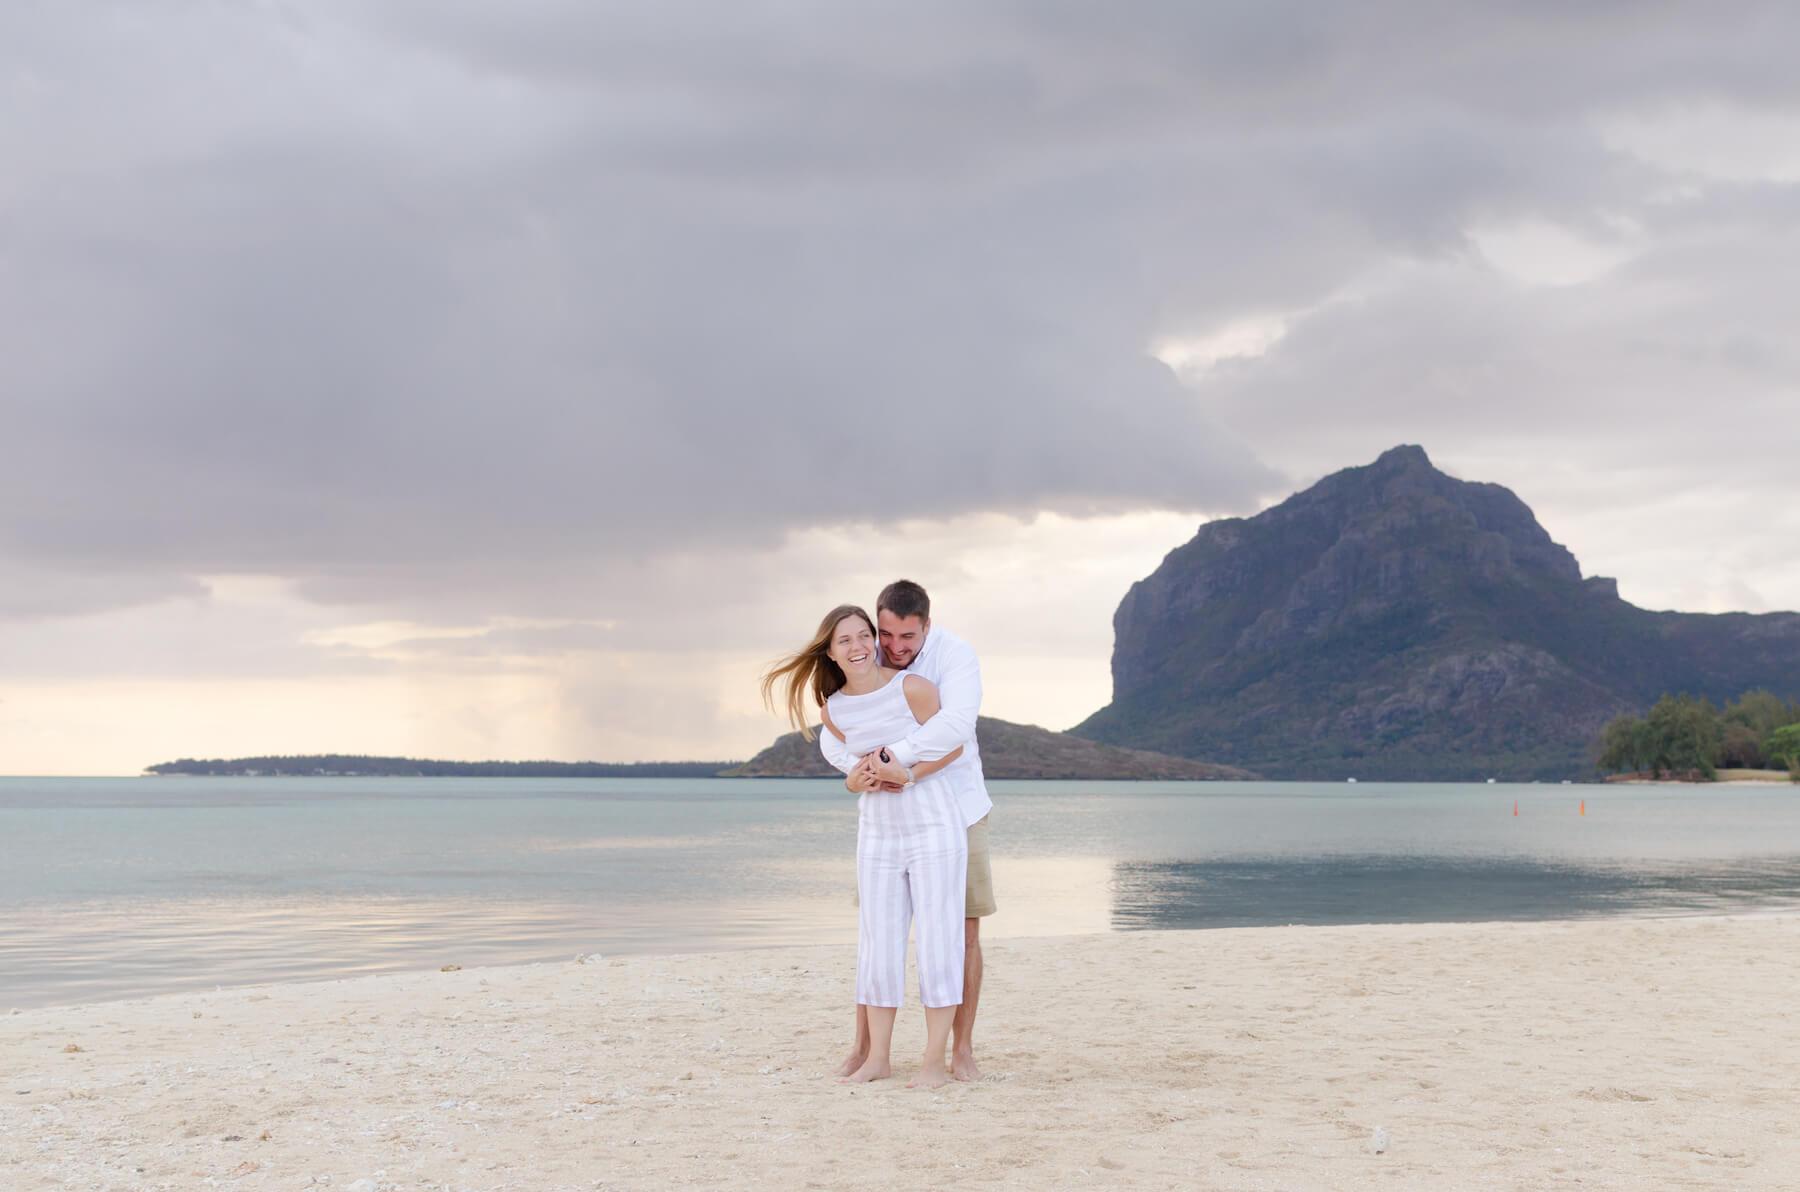 Couple in Mauritius Africa